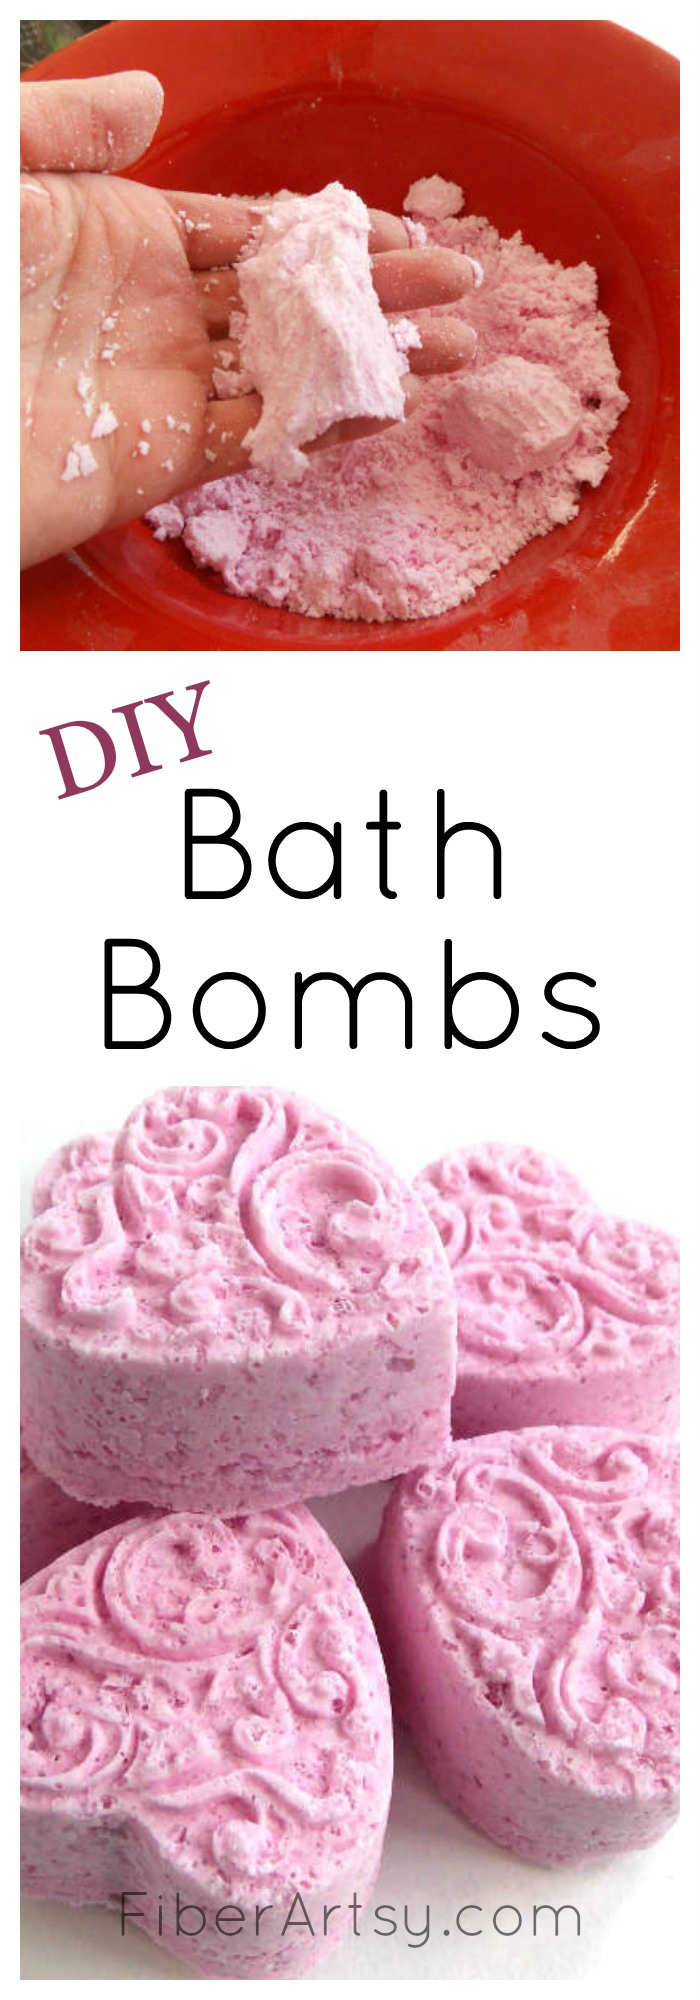 DIY Bath Bomb Recipe, FiberArtsy.com tutorial